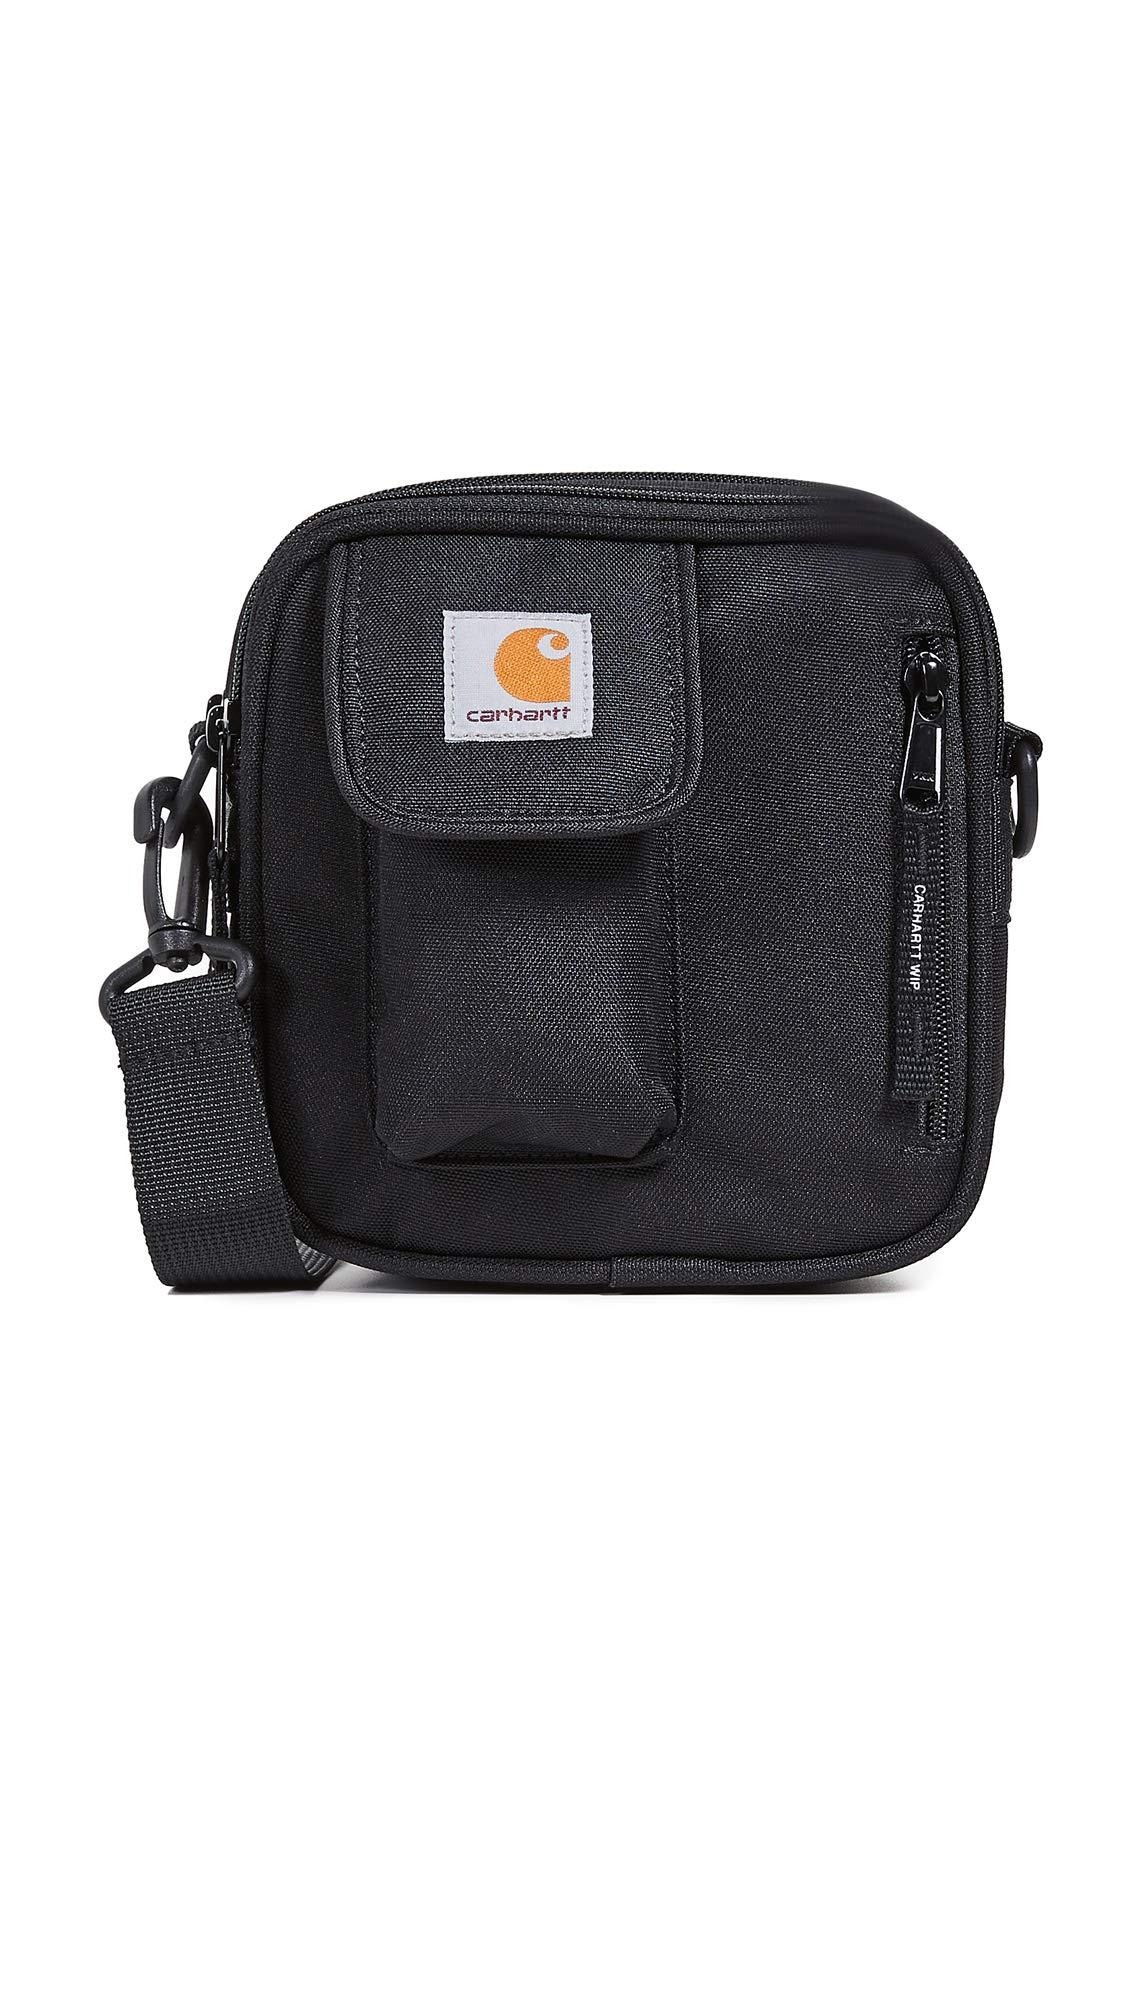 Carhartt WIP Men's Small Essentials Bag, Black, One Size